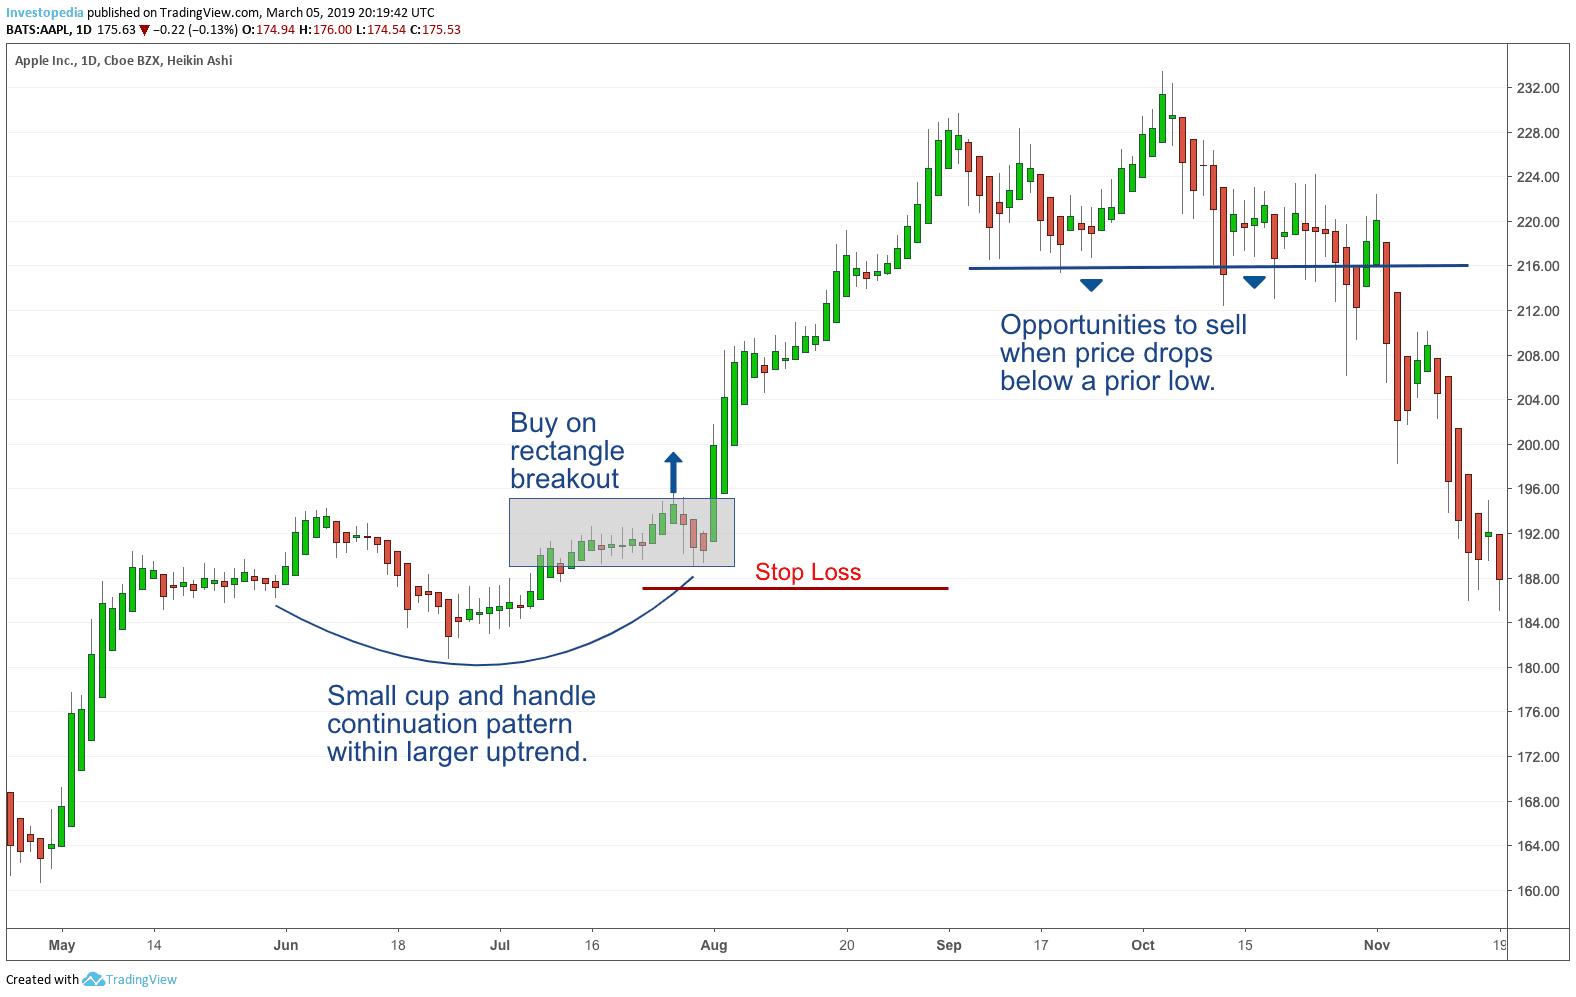 SwiГџ Trading